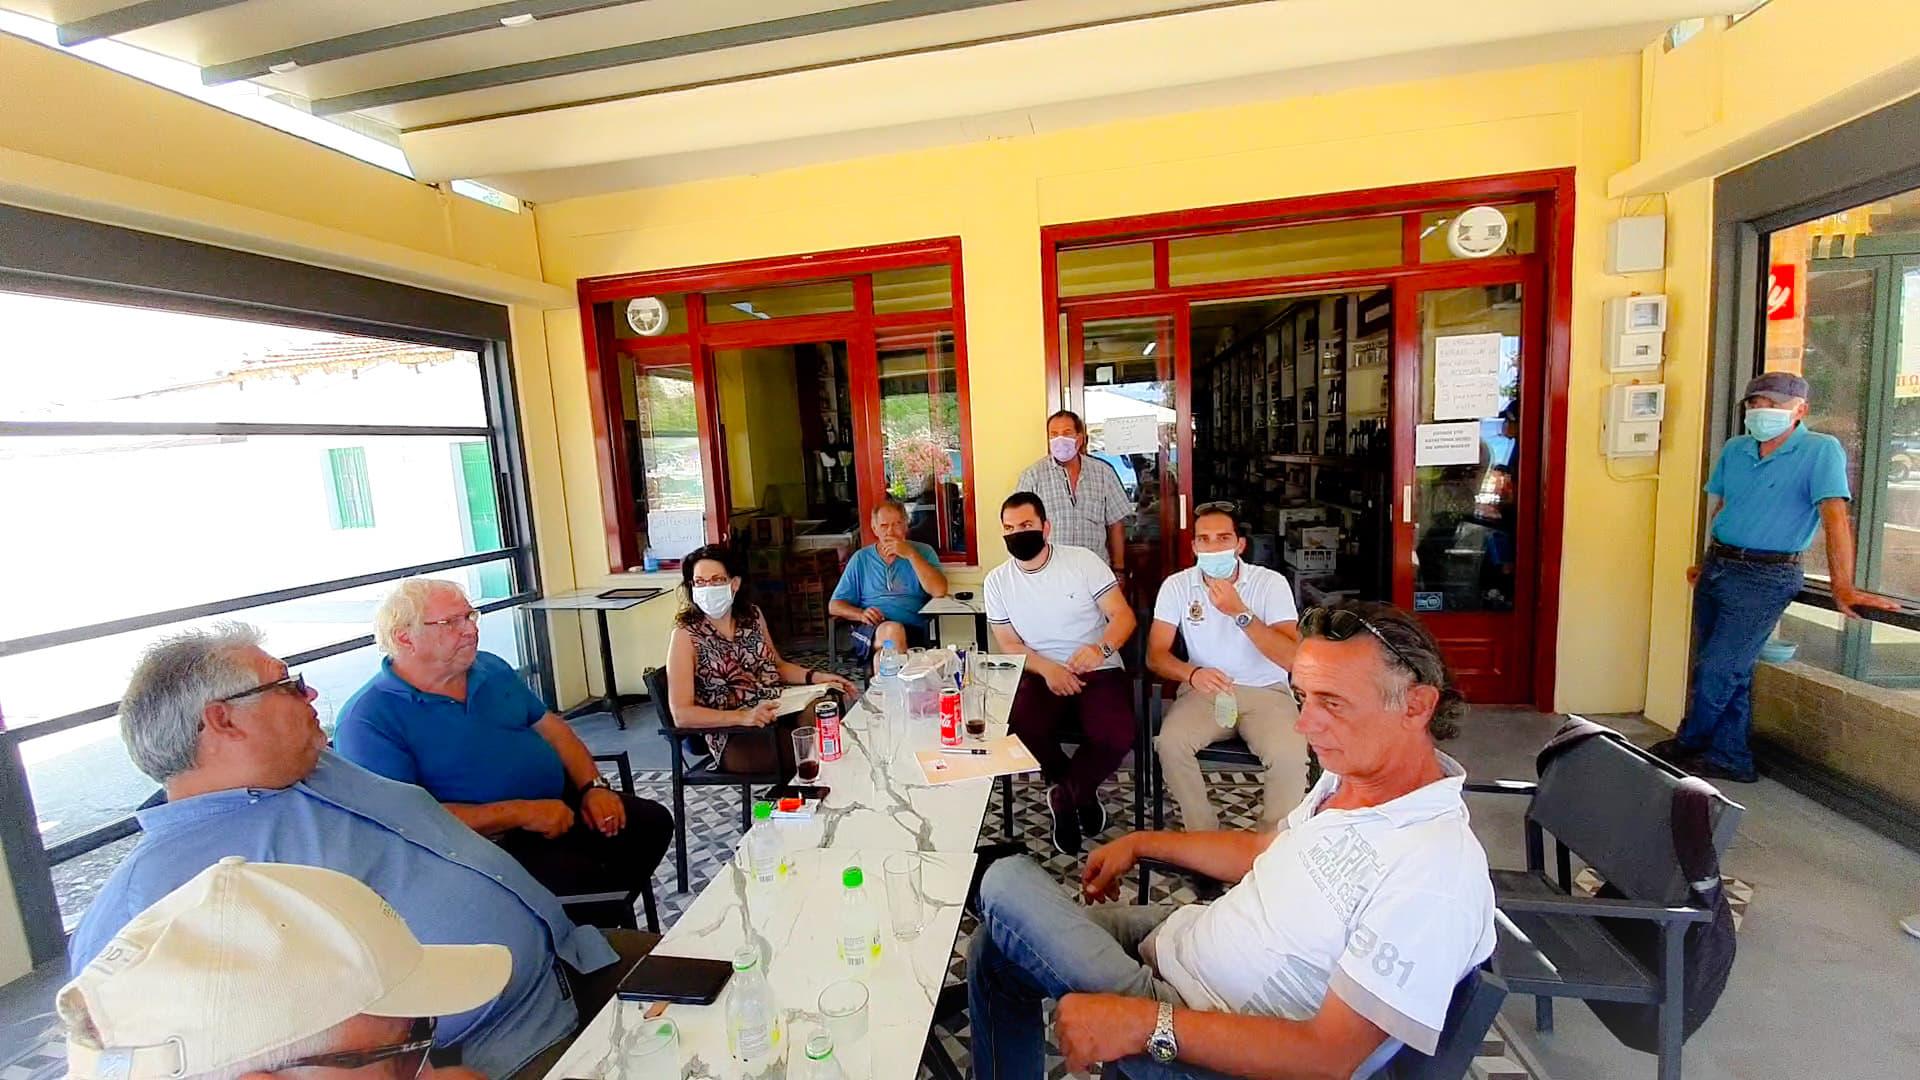 corfu.gr-2020-08-07_11-59-02_500640